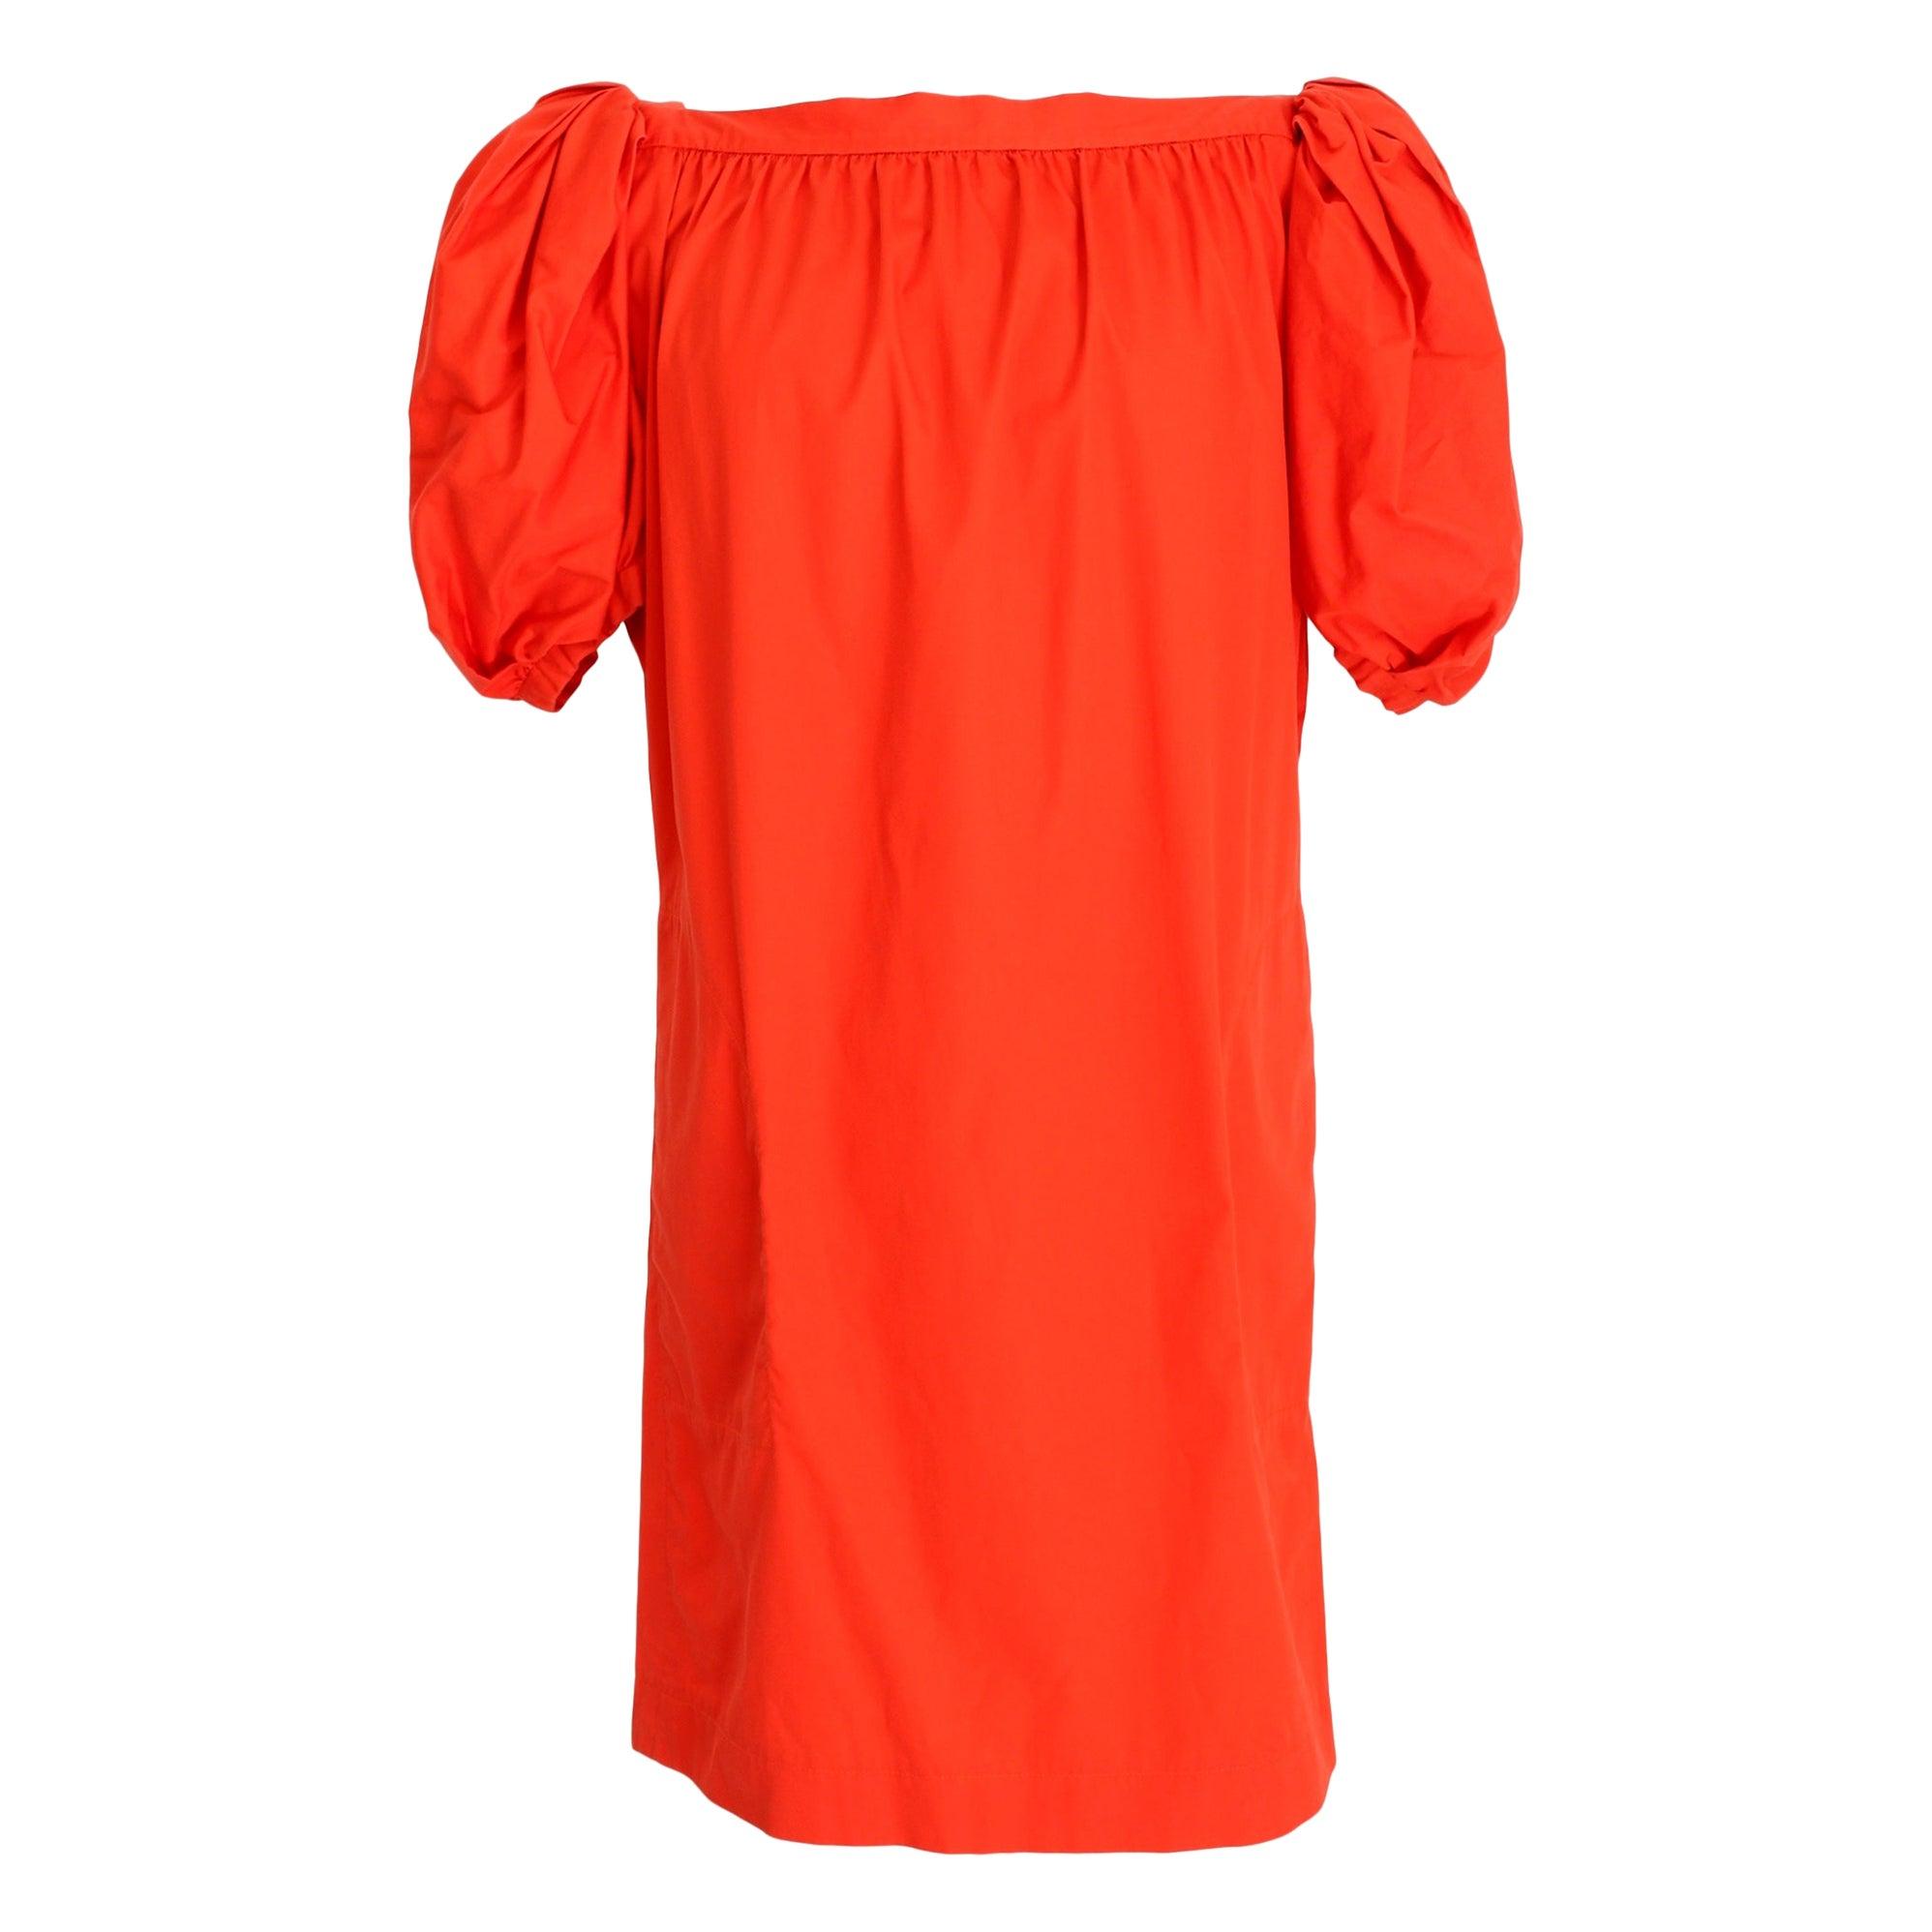 Yves Saint Laurent Rive Gauche Red Cotton Straight Cocktail Dress 1980s